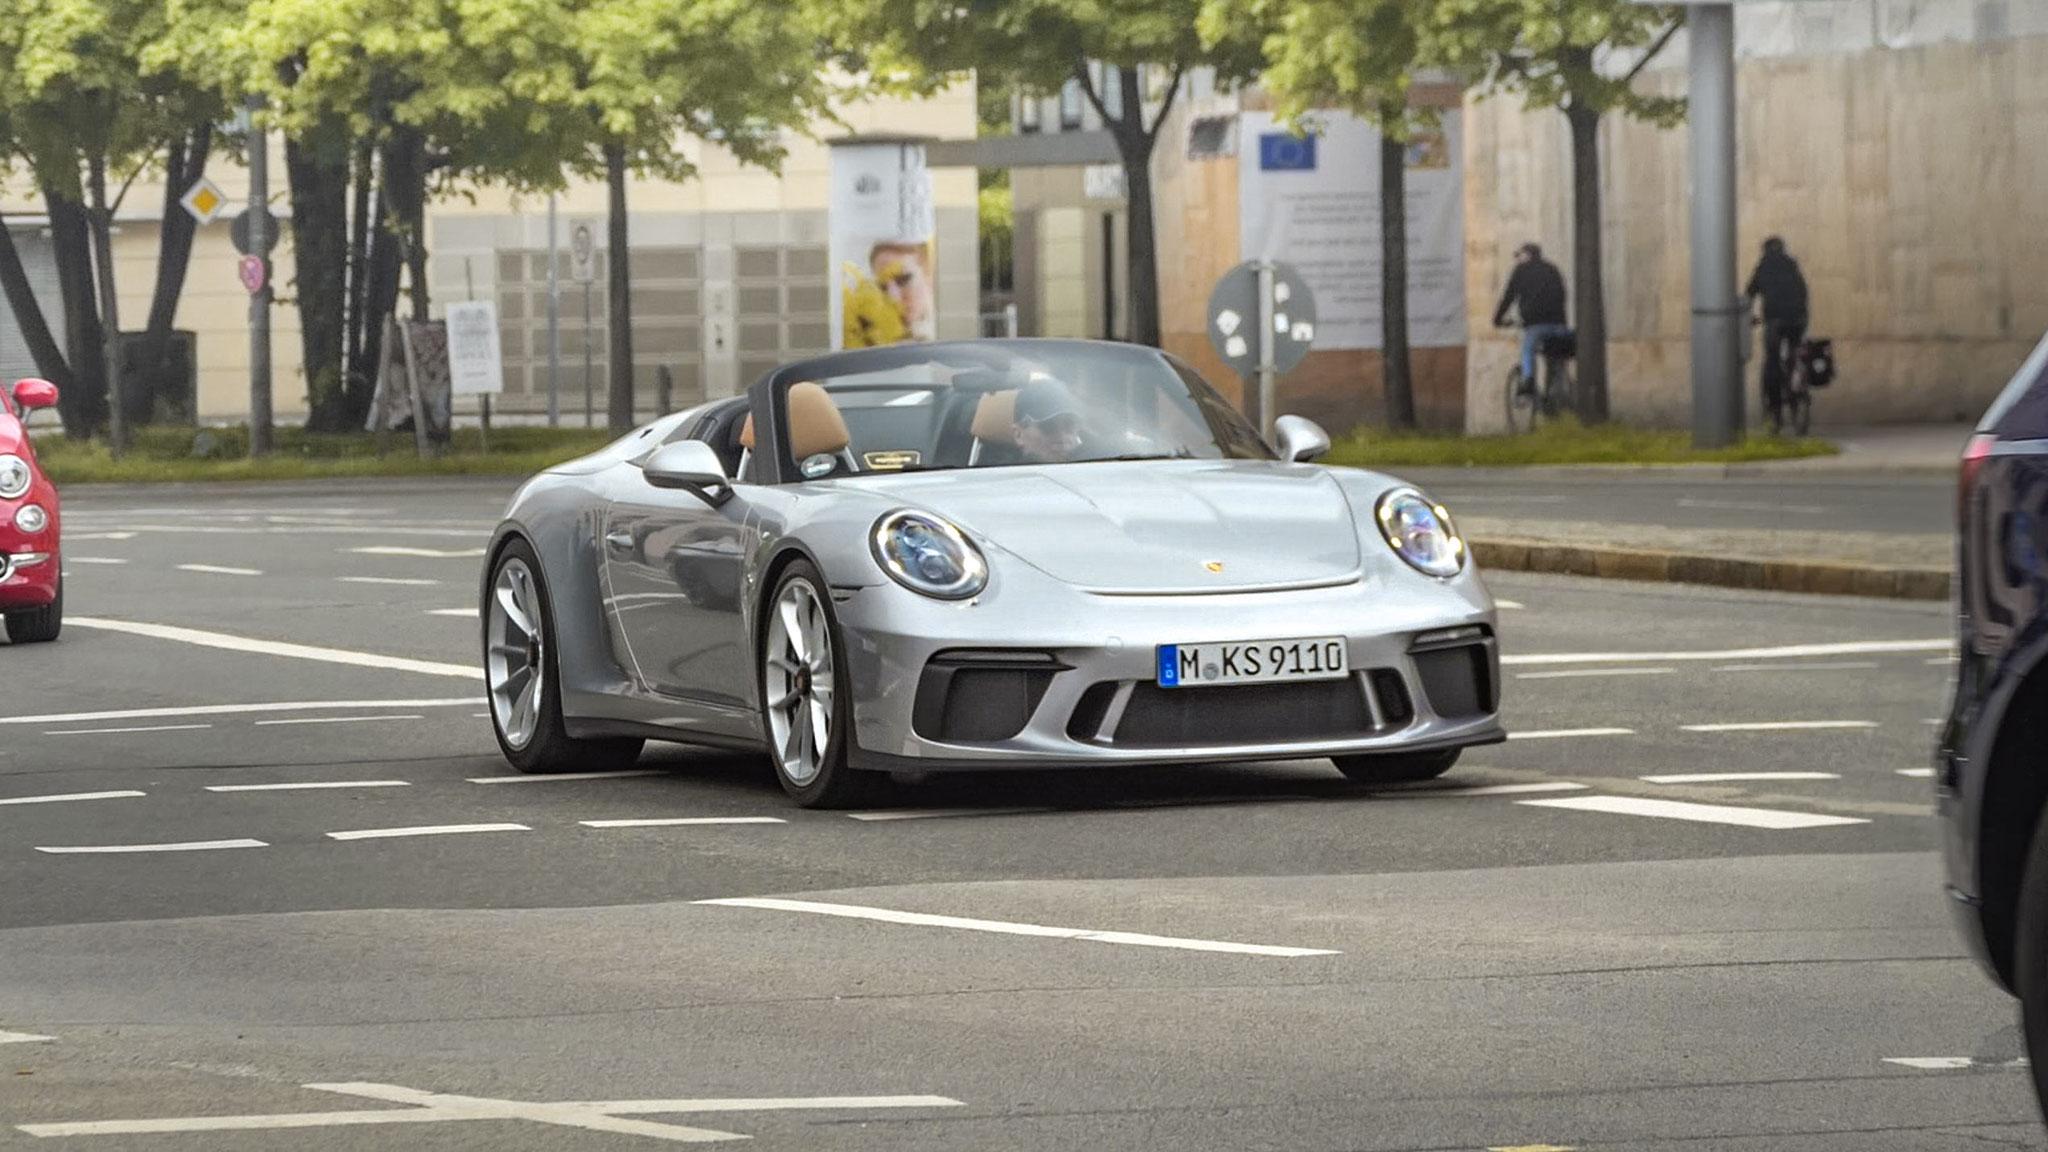 Porsche 991 Speedster - M-KS-9110